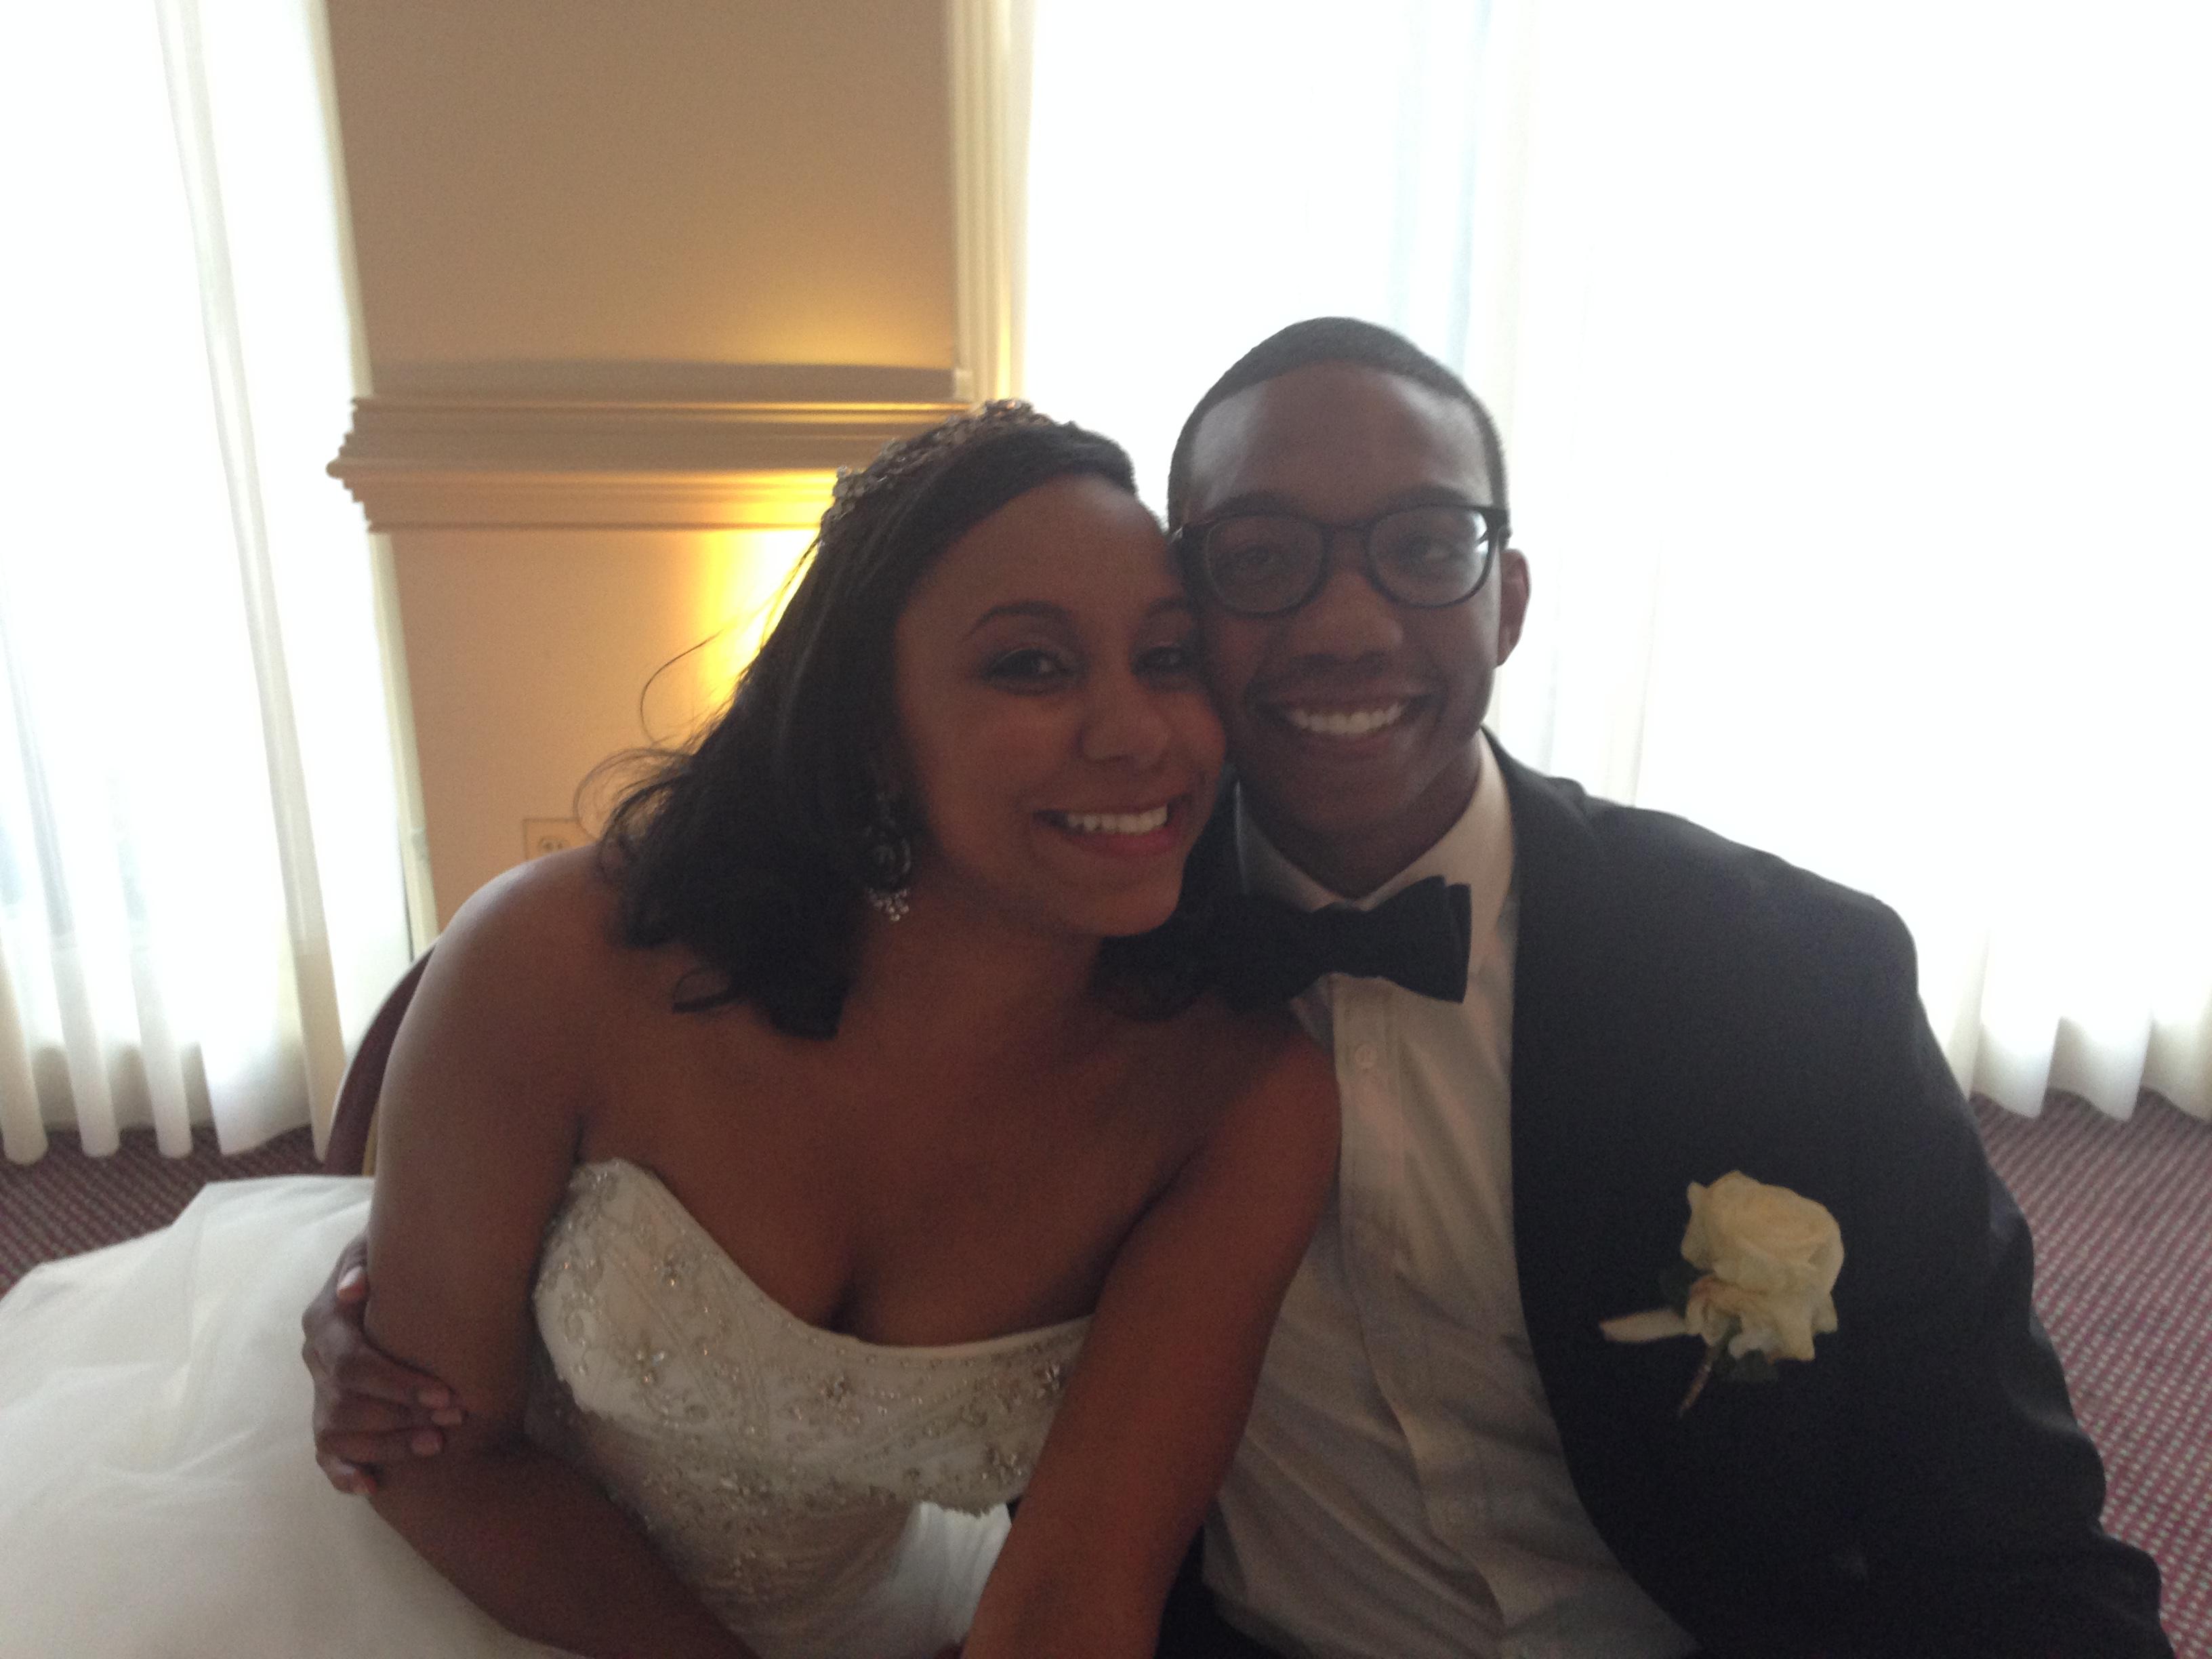 Blushing bride, happy groom